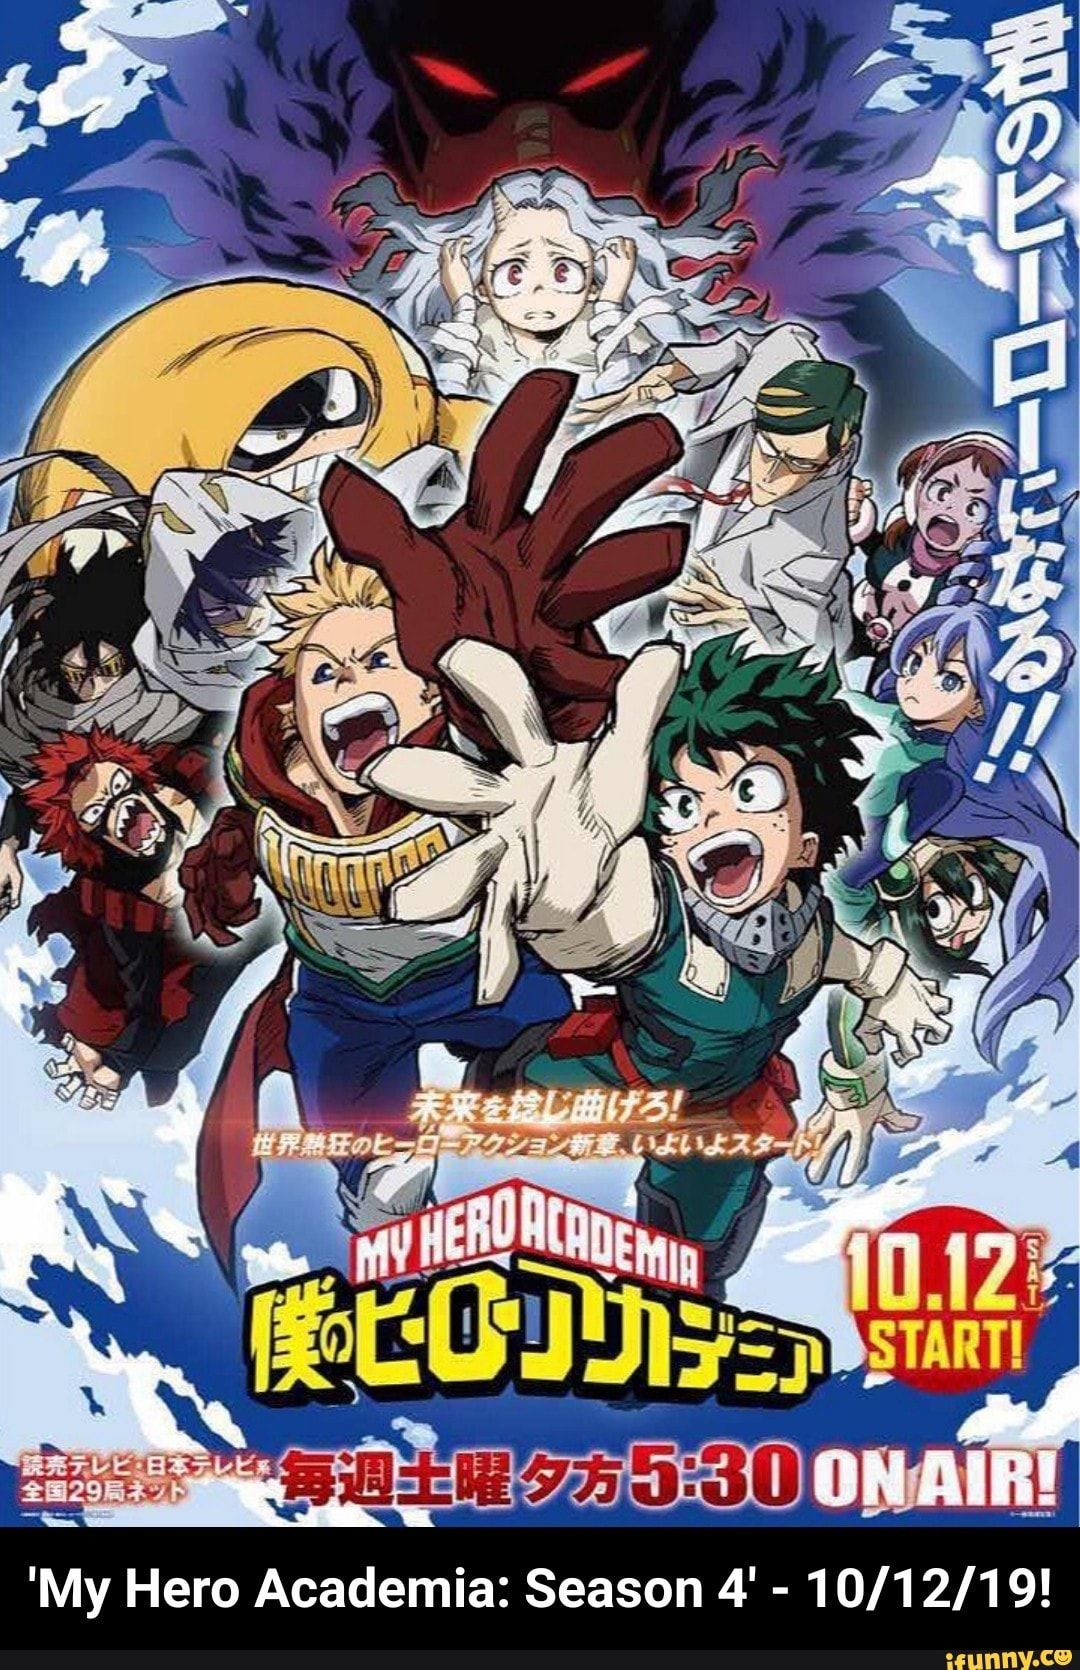 Boku No Hero Academia - Episode 8 Vostfr Saison 4 : academia, episode, vostfr, saison, Academia:, Season, 10/12/19!, IFunny, Academia, Episodes,, Poster,